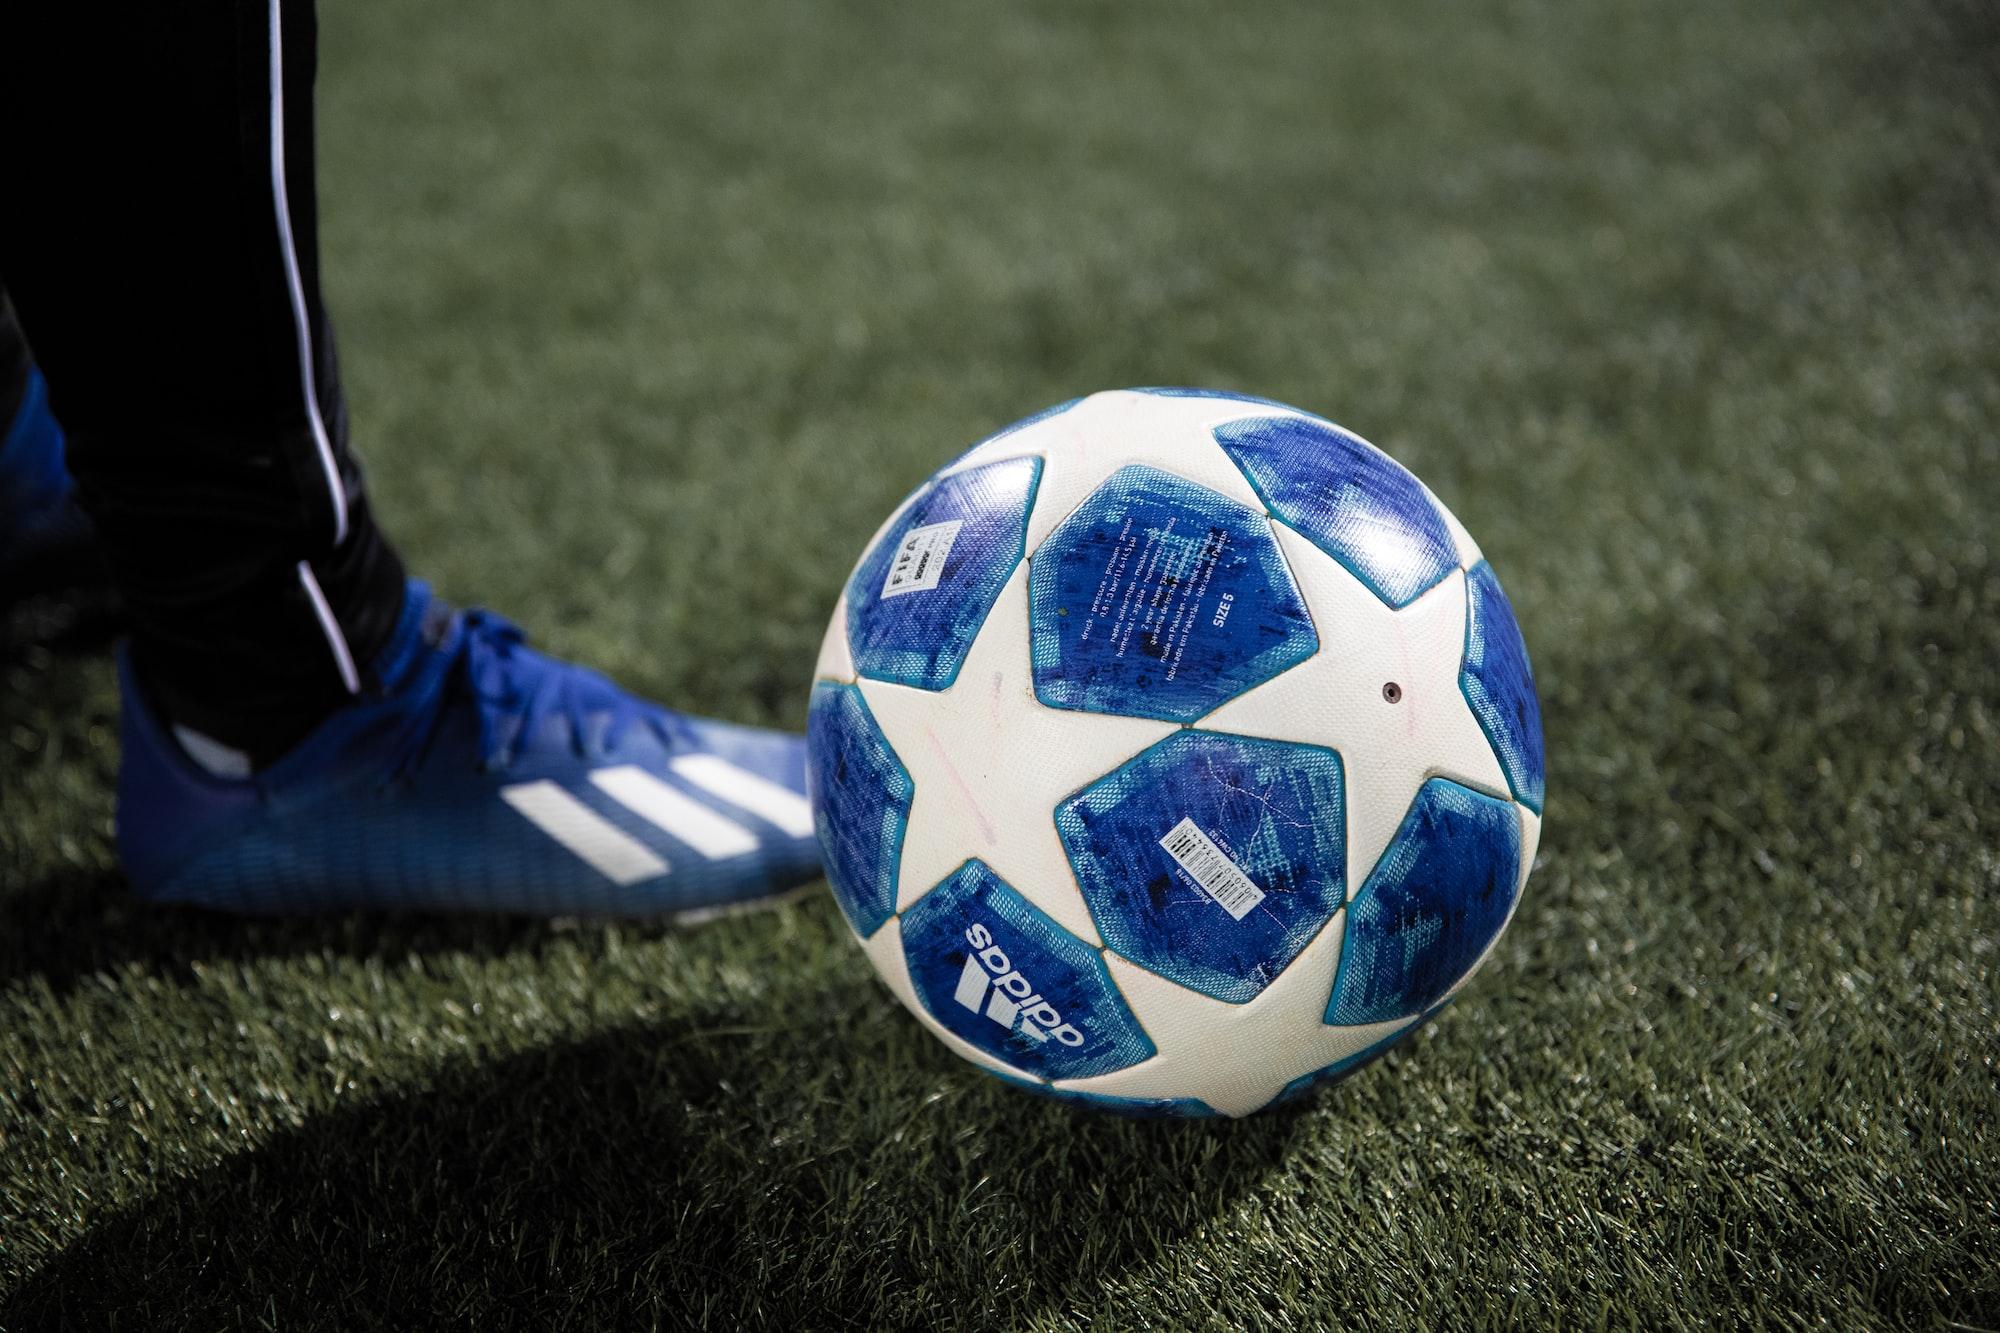 Pronostici oggi: Parma-Inter, Liverpool-Chelsea e Fulham-Tottenham